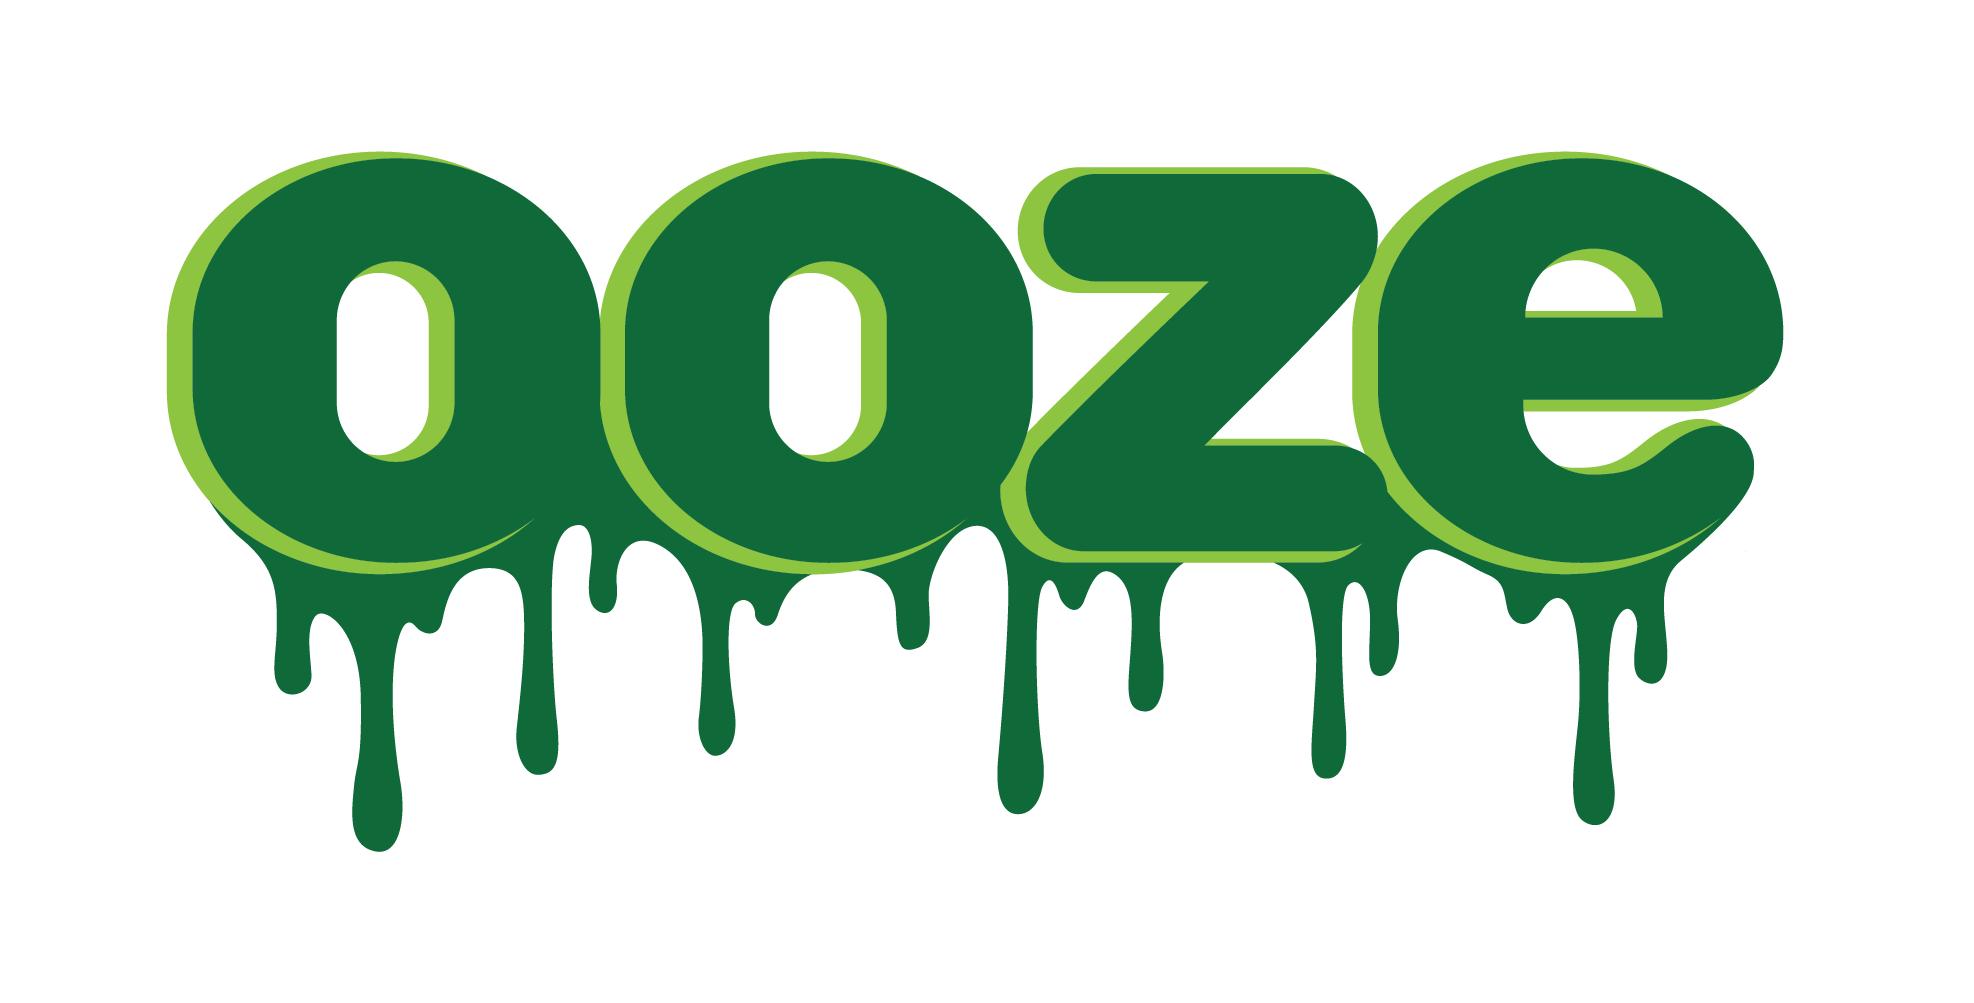 Ooze Logo.png